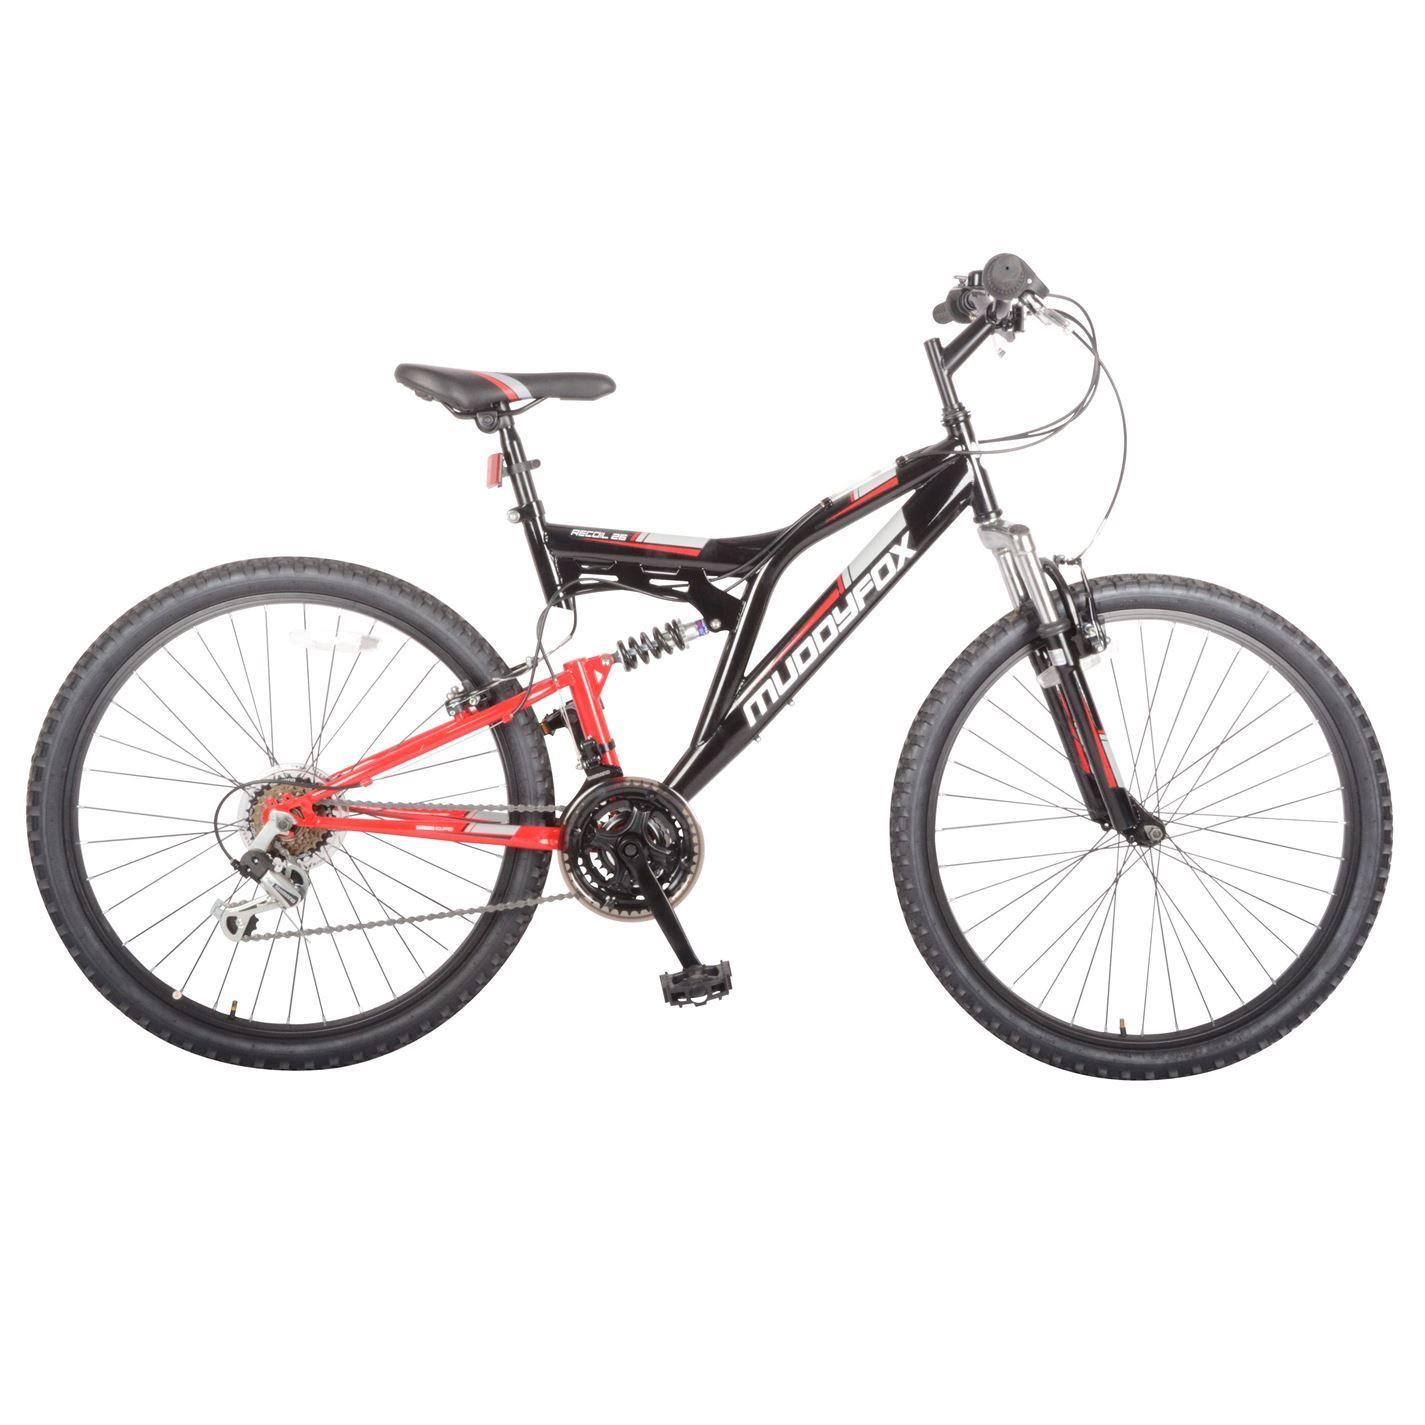 Muddyfox Mens Recoil26 Mountain Bike Dual Suspension